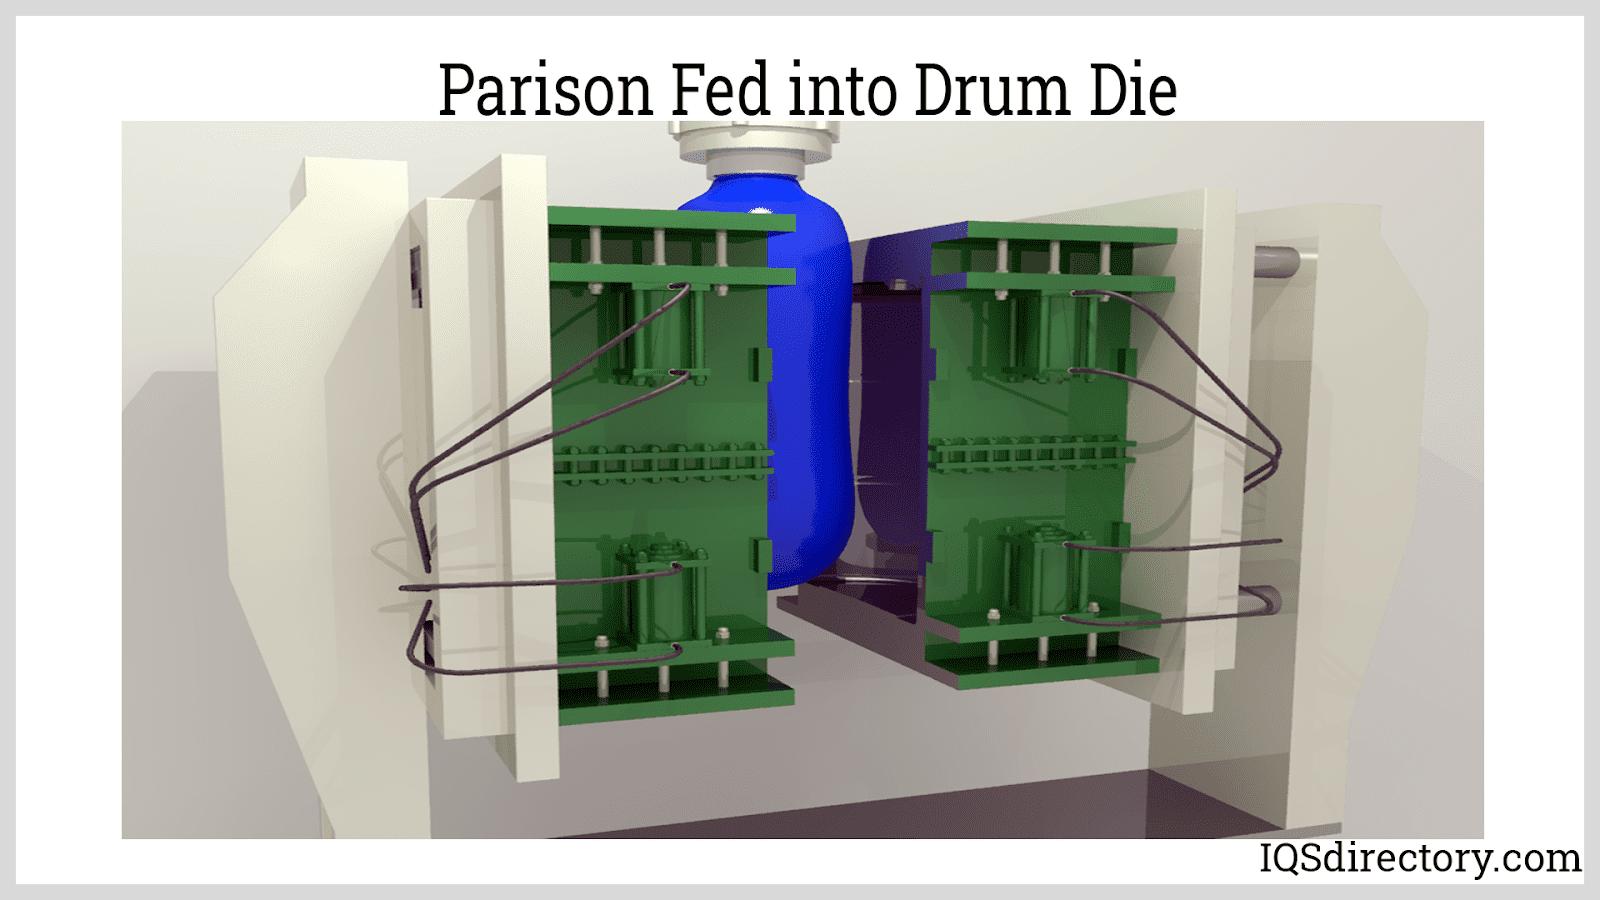 Parison Fed into Drum Die